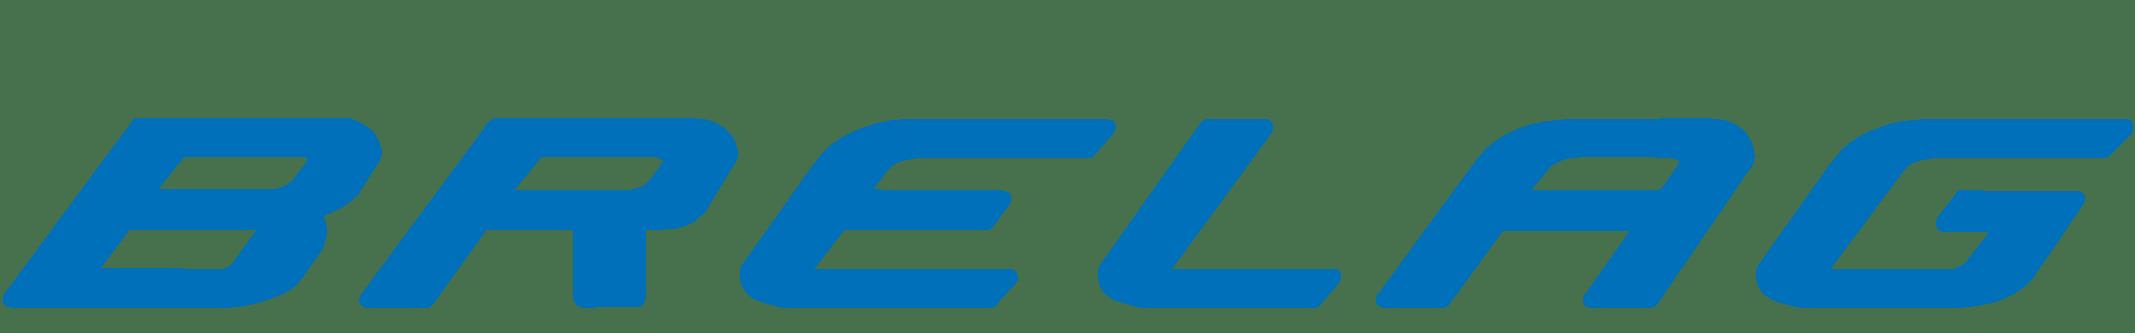 brelag corporate logo